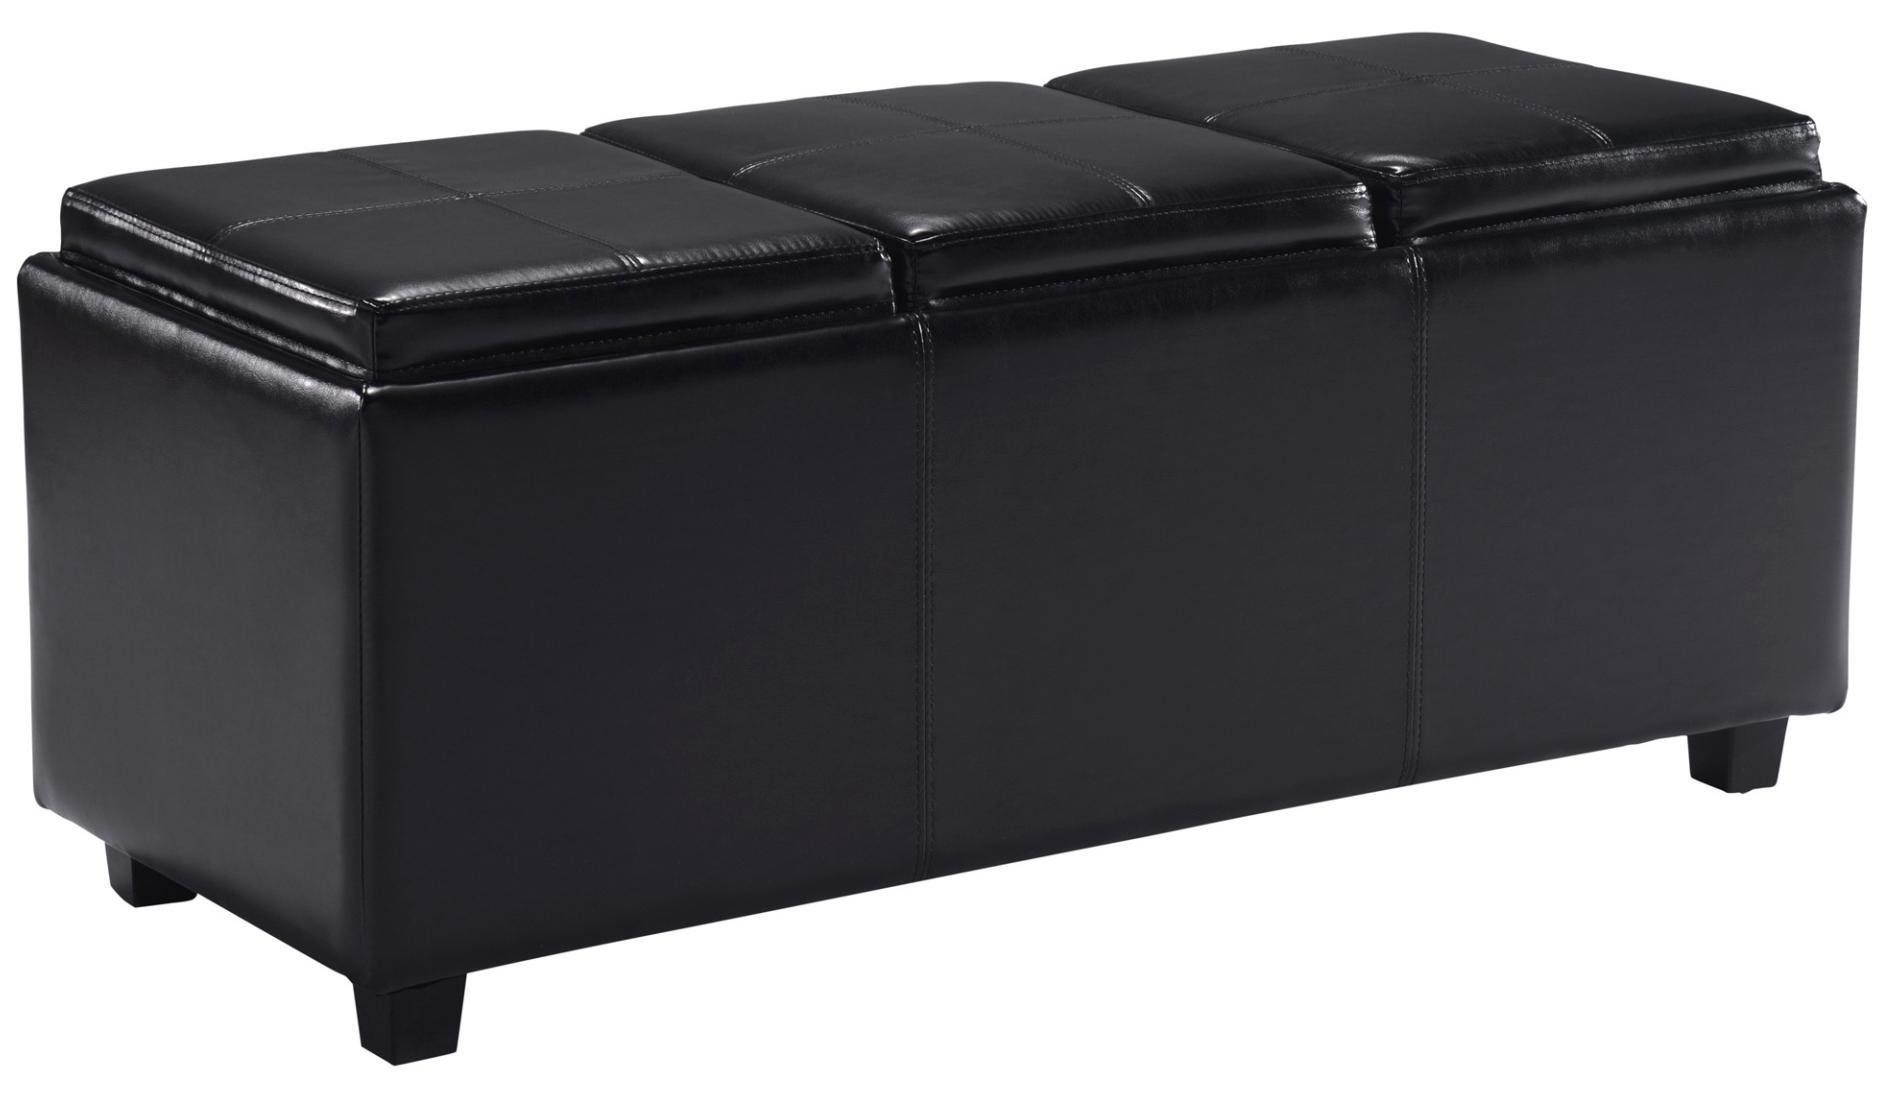 Large Black Tray For Ottoman Items Similar To Large  : 08013638 410e 4436 846c 213da4ed87dbJPGV326389509 from livinginmoments.com size 1896 x 1097 jpeg 85kB